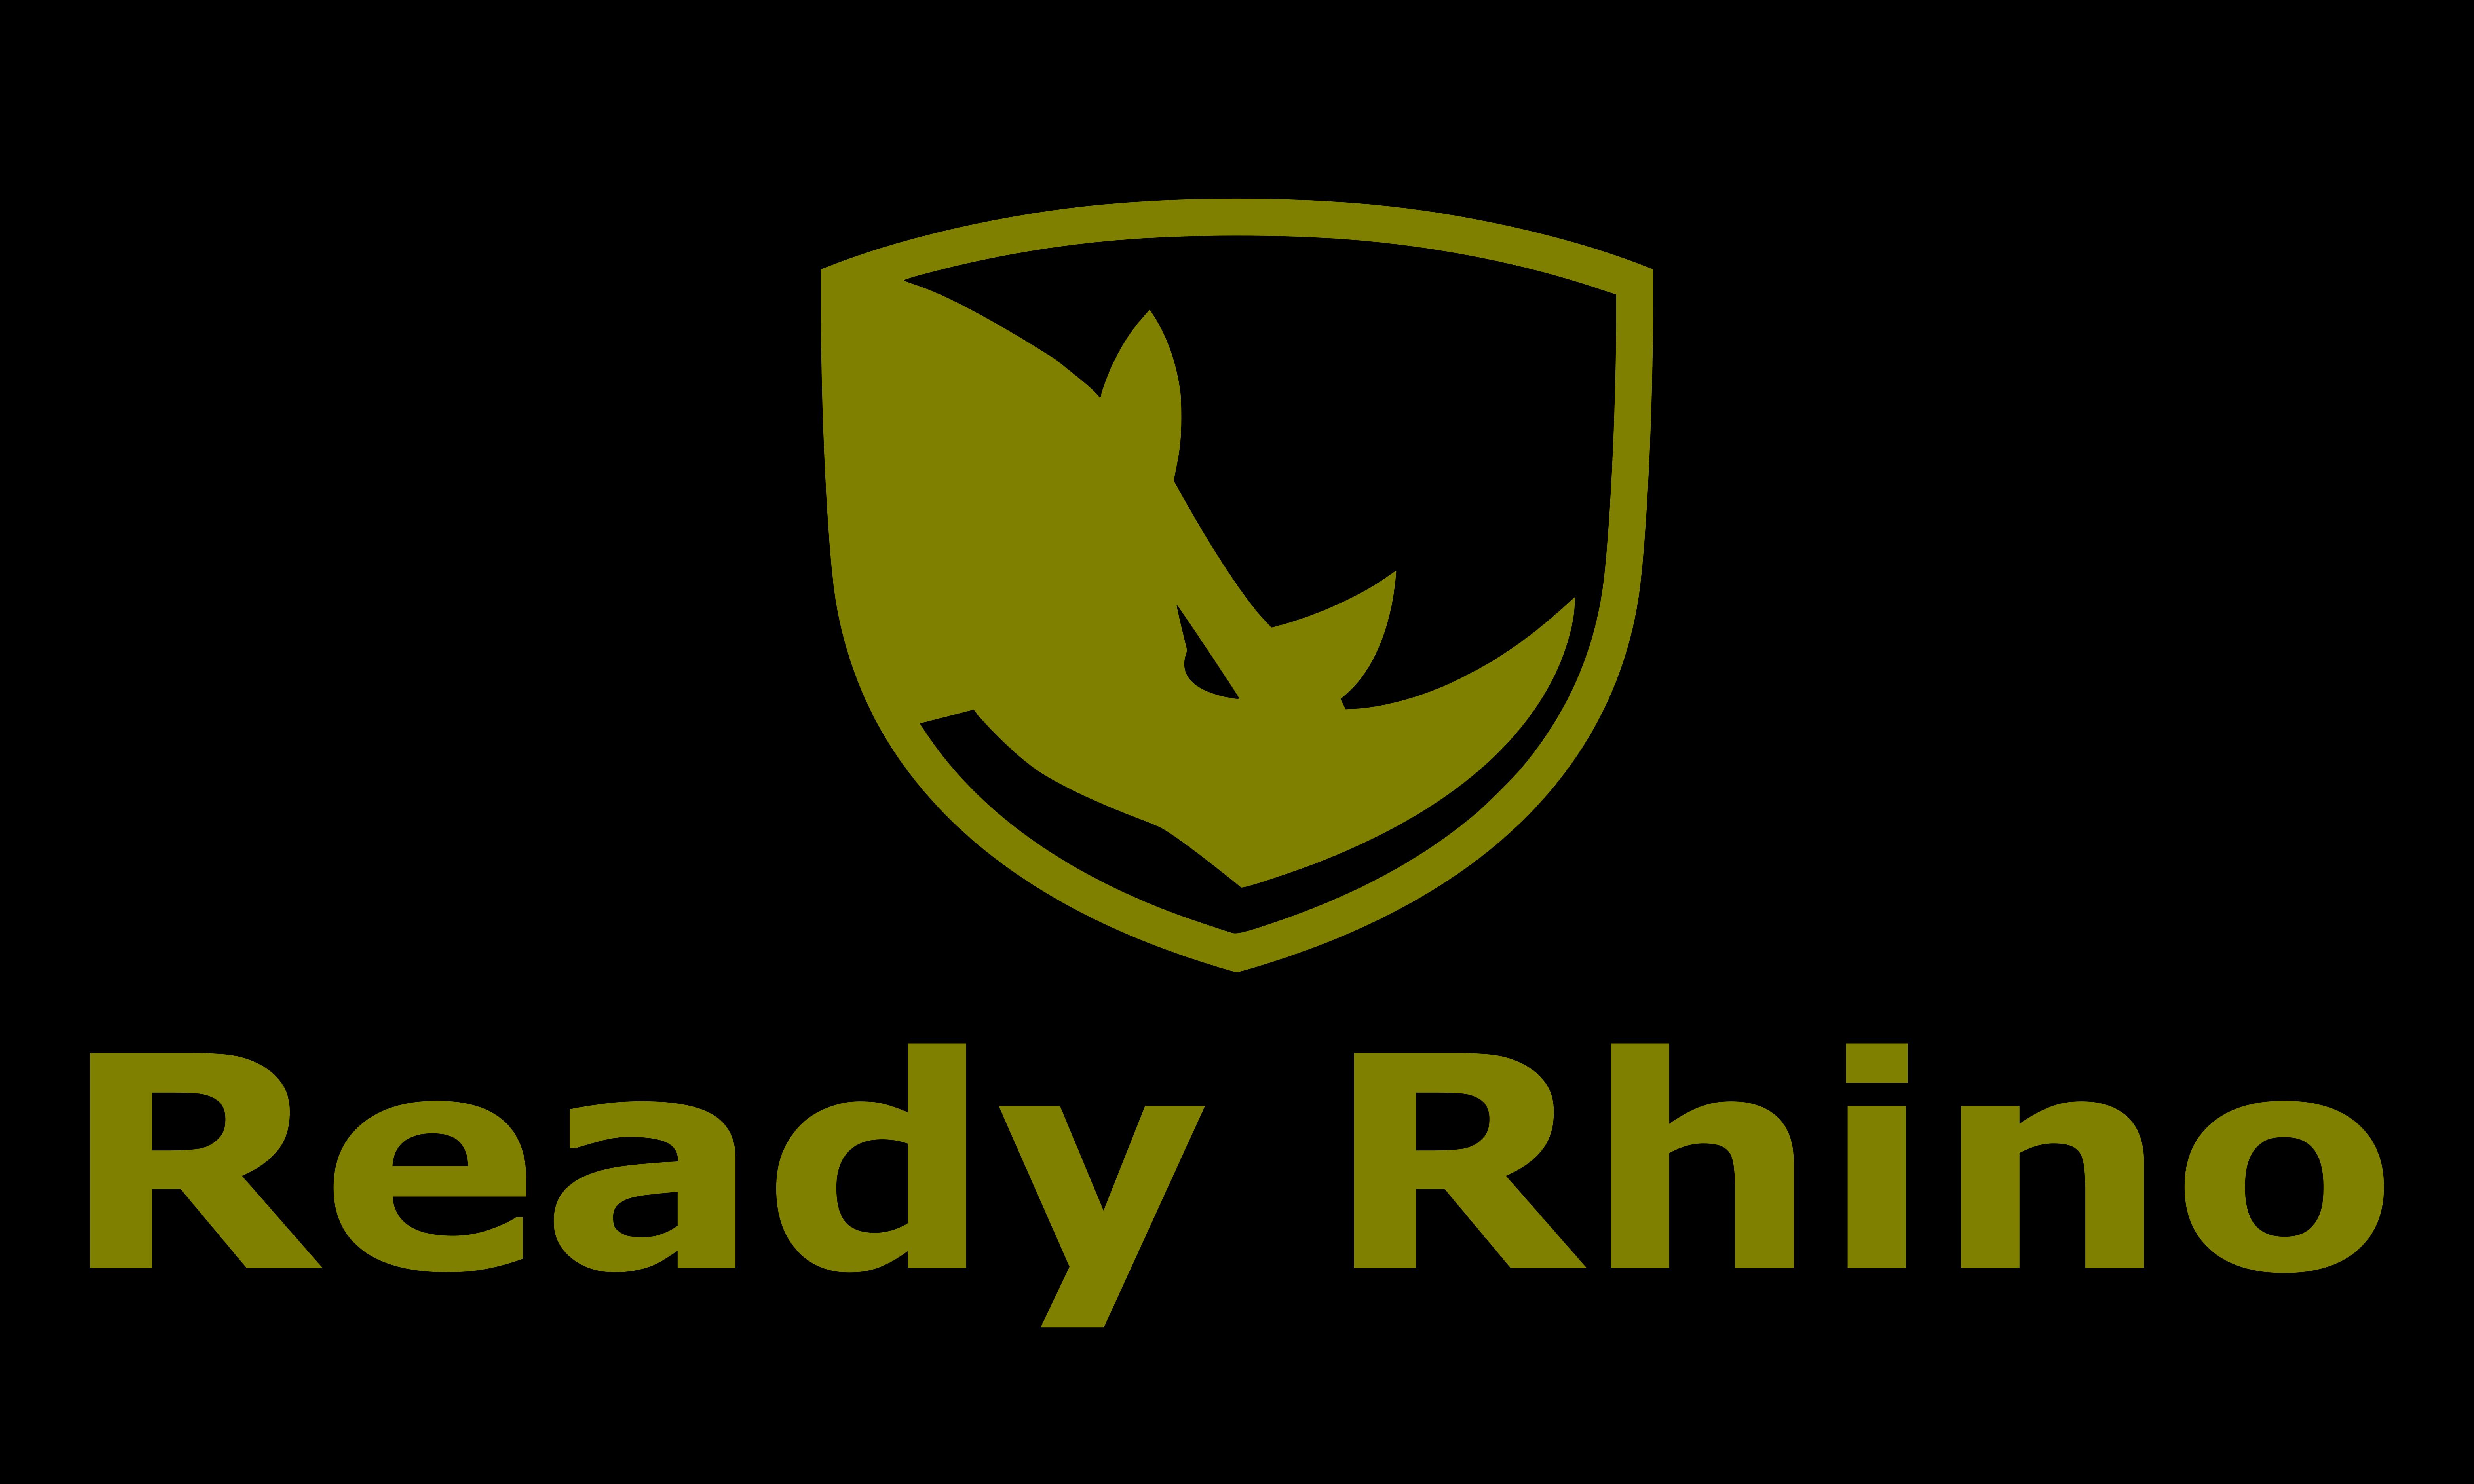 ReadyRhinoLogoFinalGreen.png